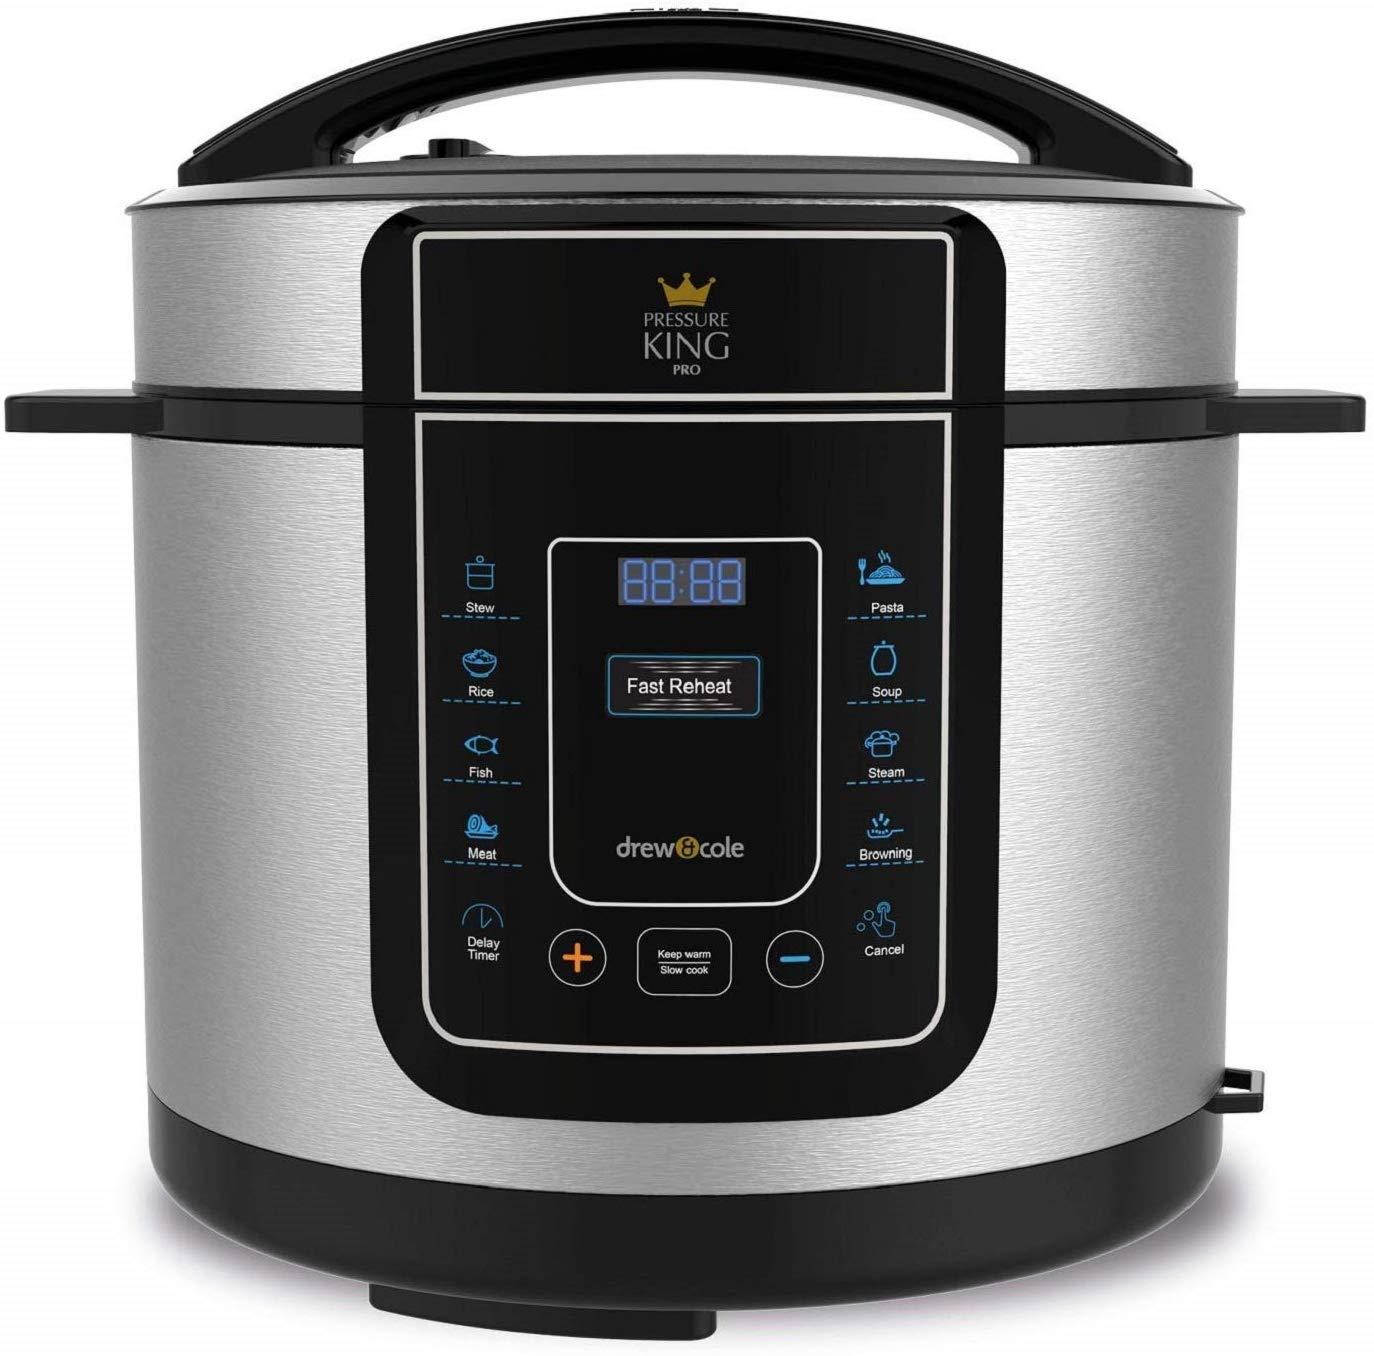 Pressure king pro 8 in 1 digital pressure cooker £25 instore @ Morrisons Walsall